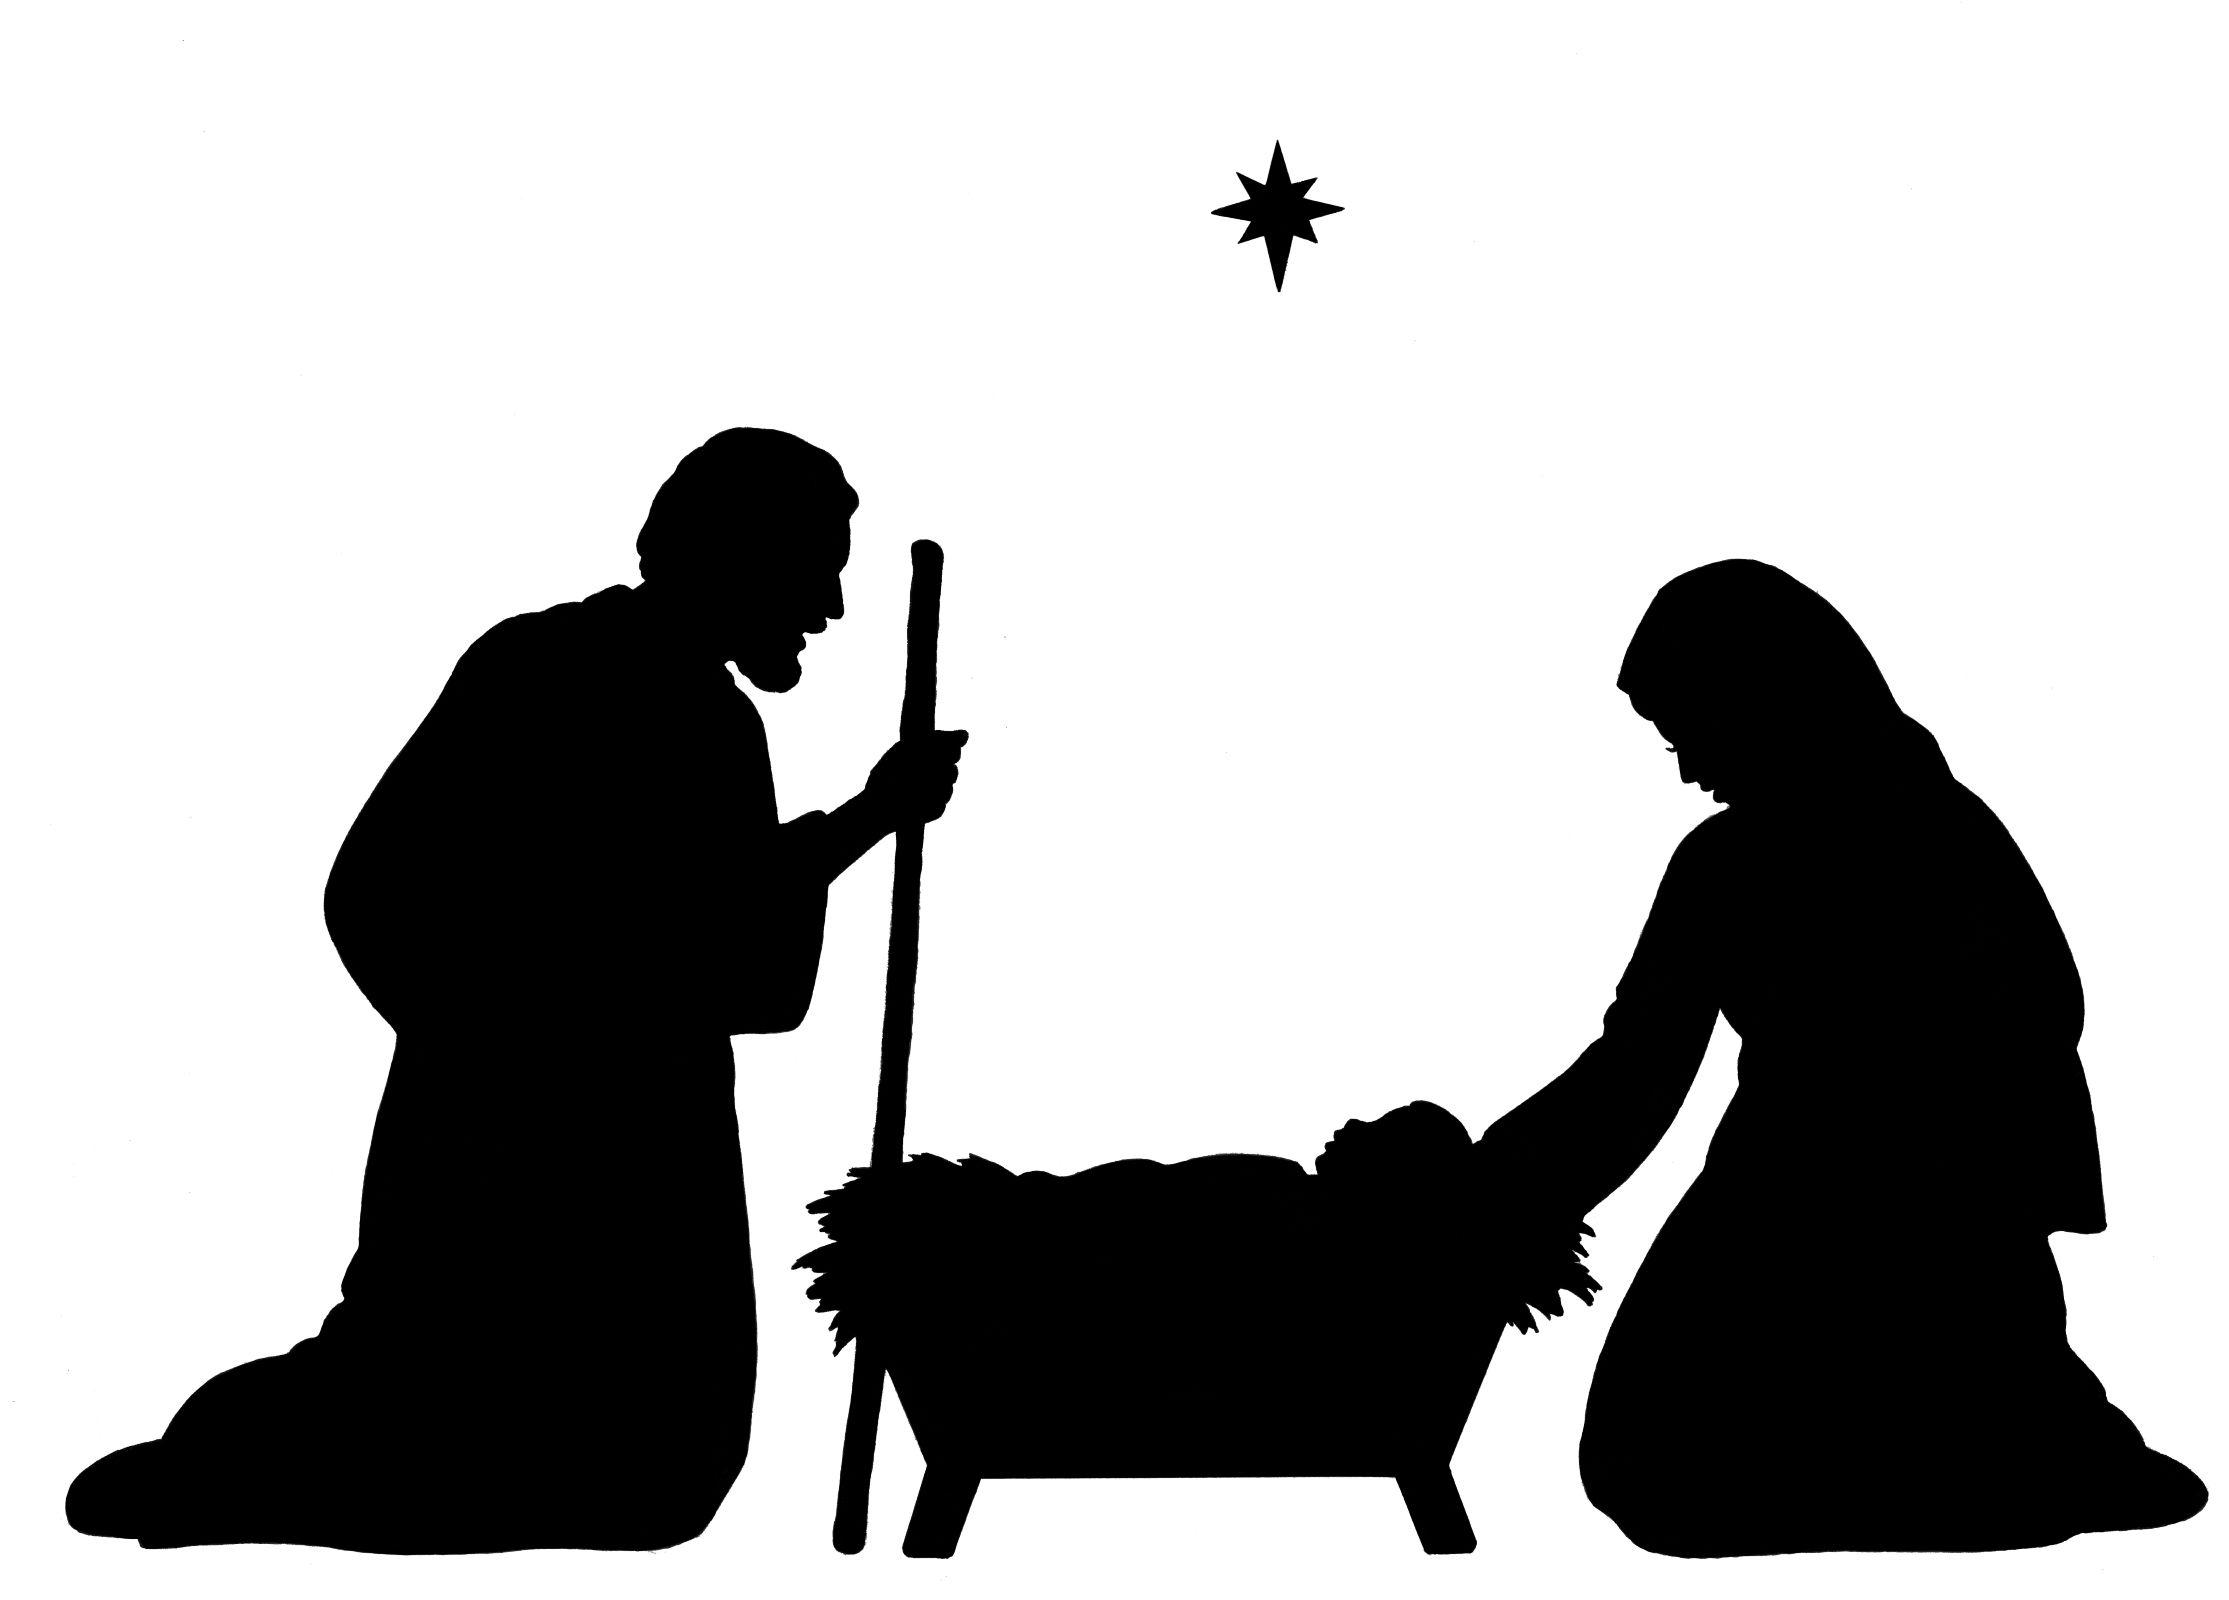 2229x1600 Nativity Silhouette 1168754 Wallpaper.jpg Pixels